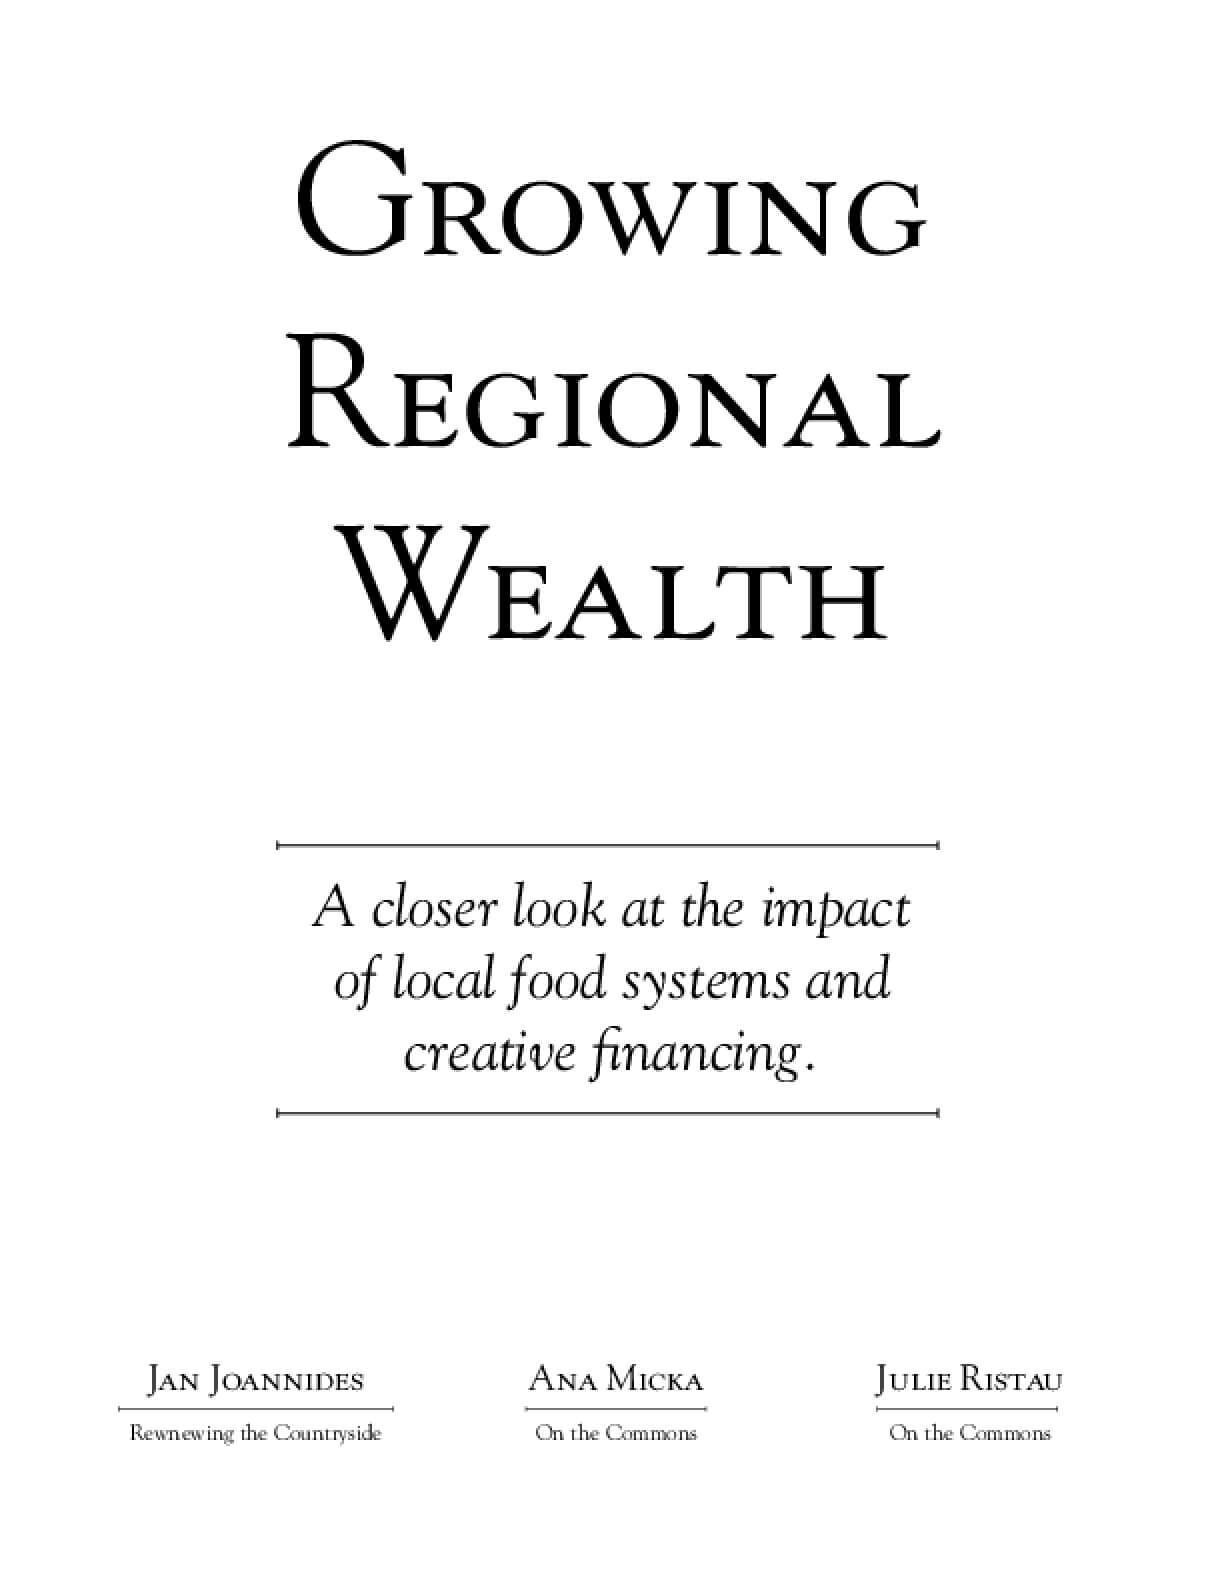 Growing Regional Wealth